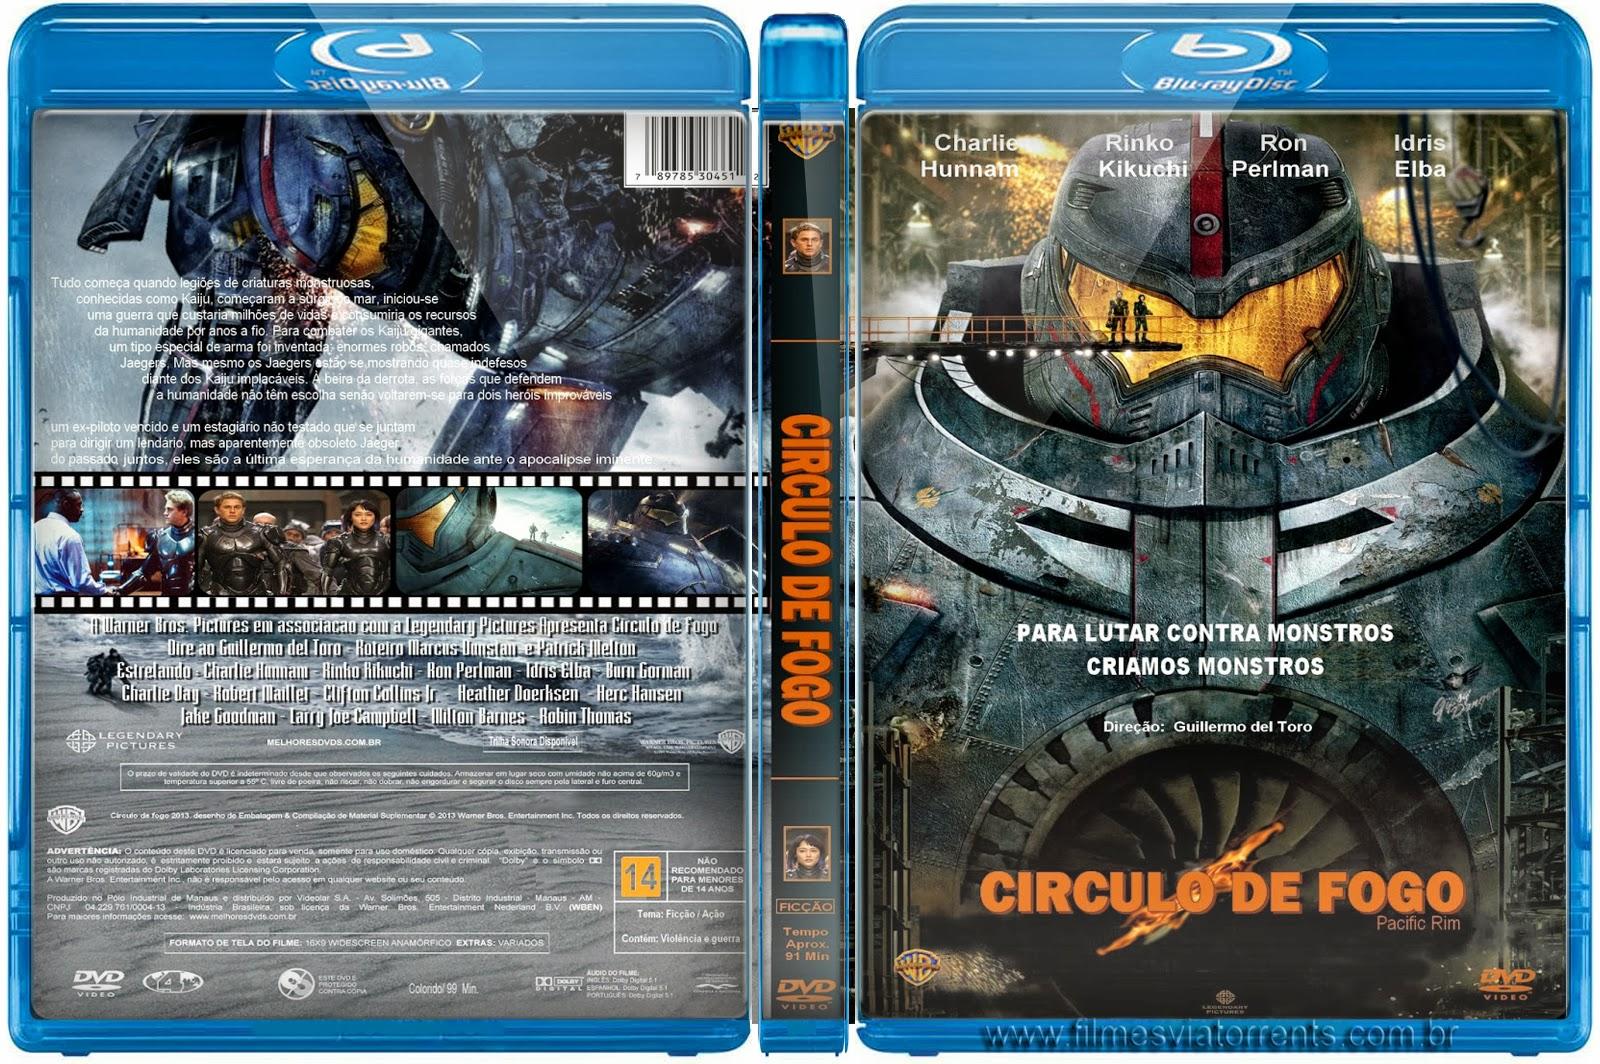 Círculo De Fogo,Pacific Rim Blu-ray Torrent